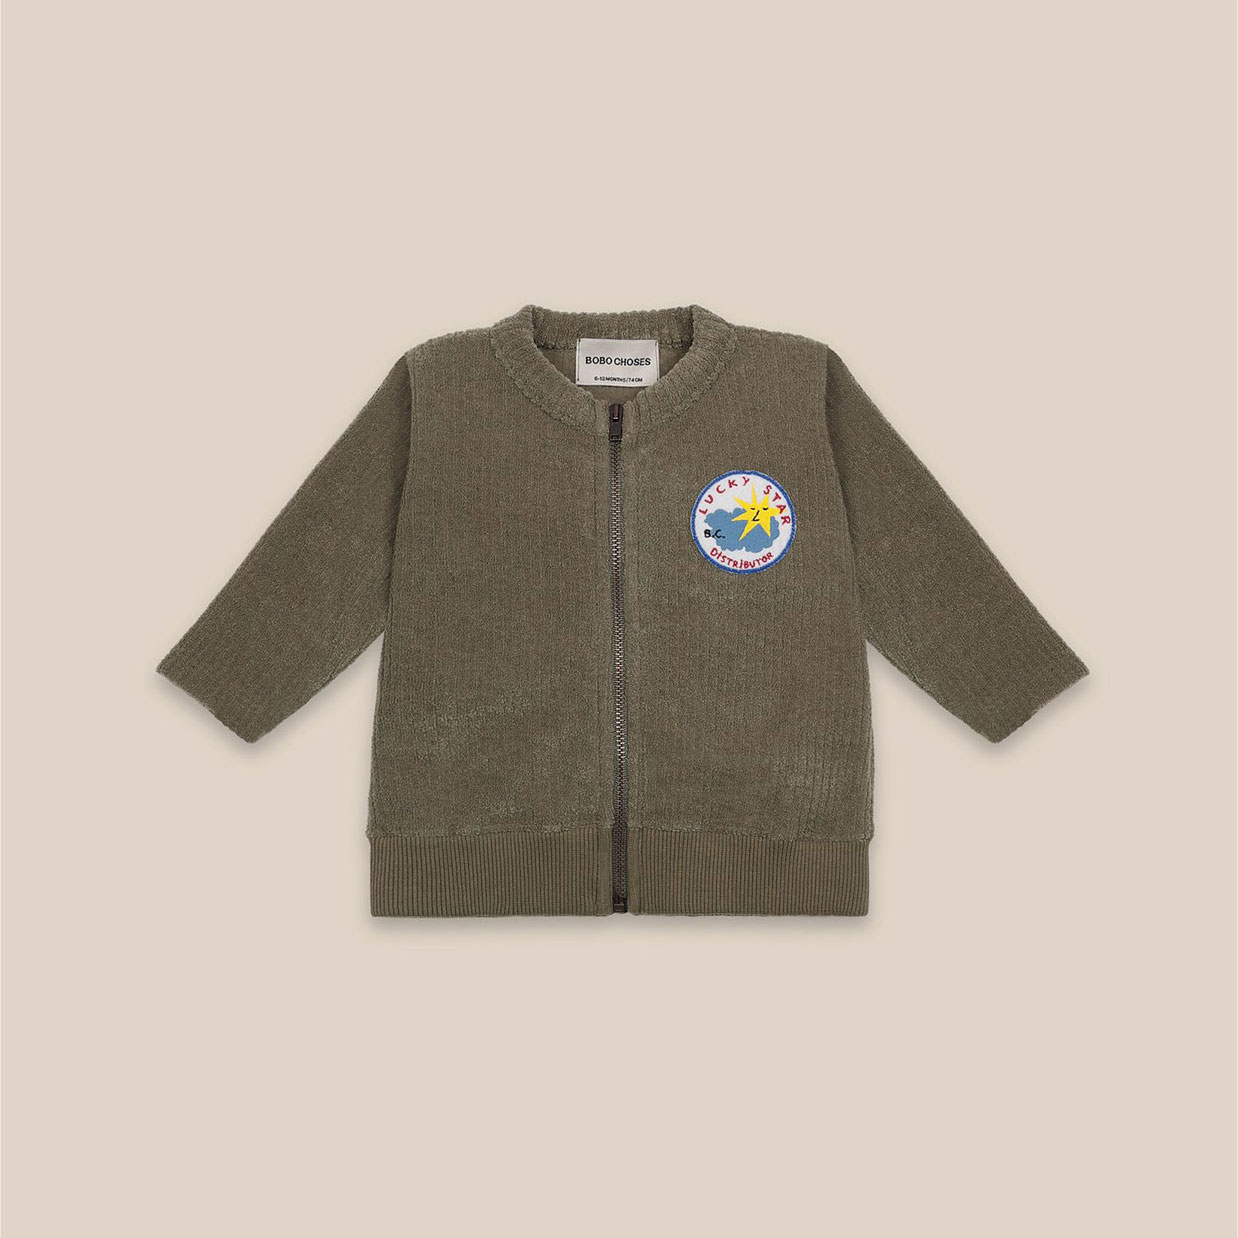 Bobo Choses - Baby Lucky Star Patch Zipped Sweatshirt